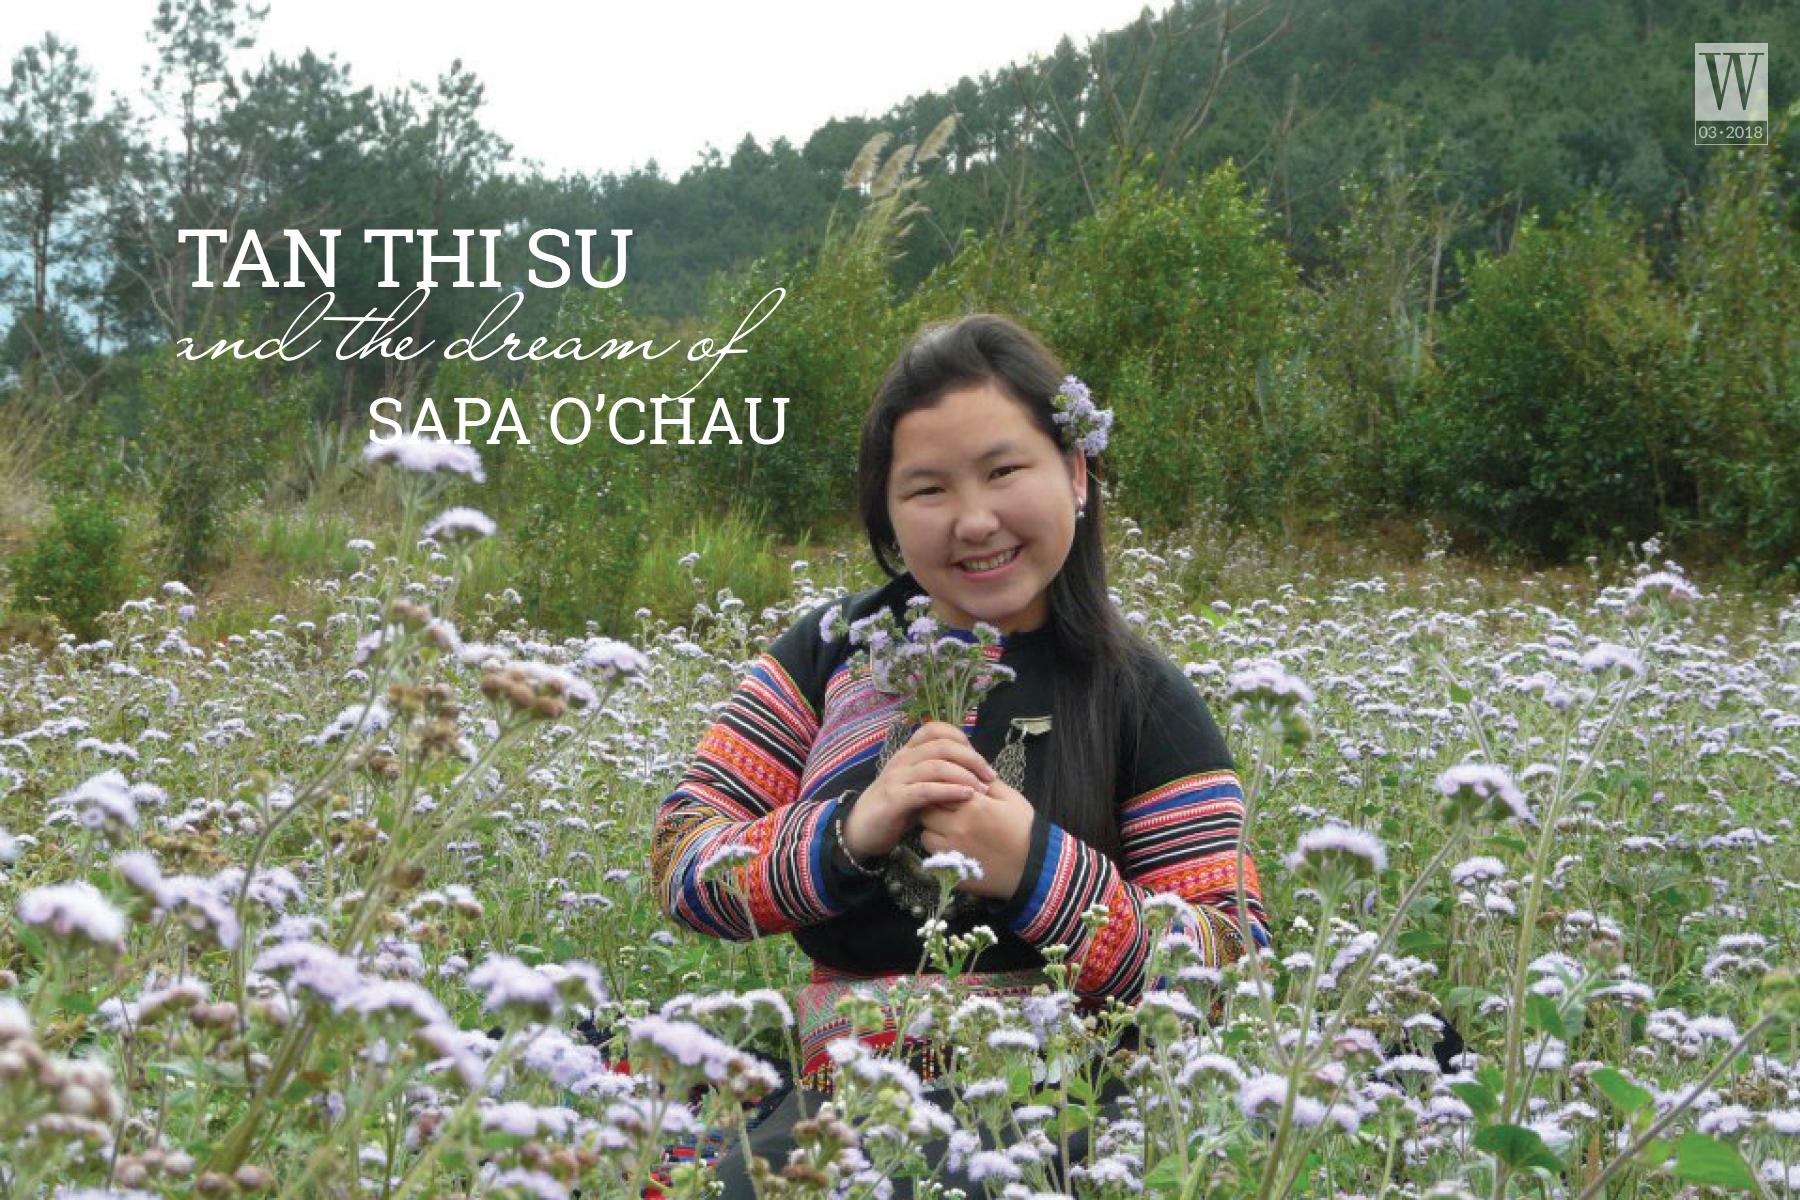 Wanderlust Tips Magazine   Tan Thi Su and the dream of Sa Pa O'Chau